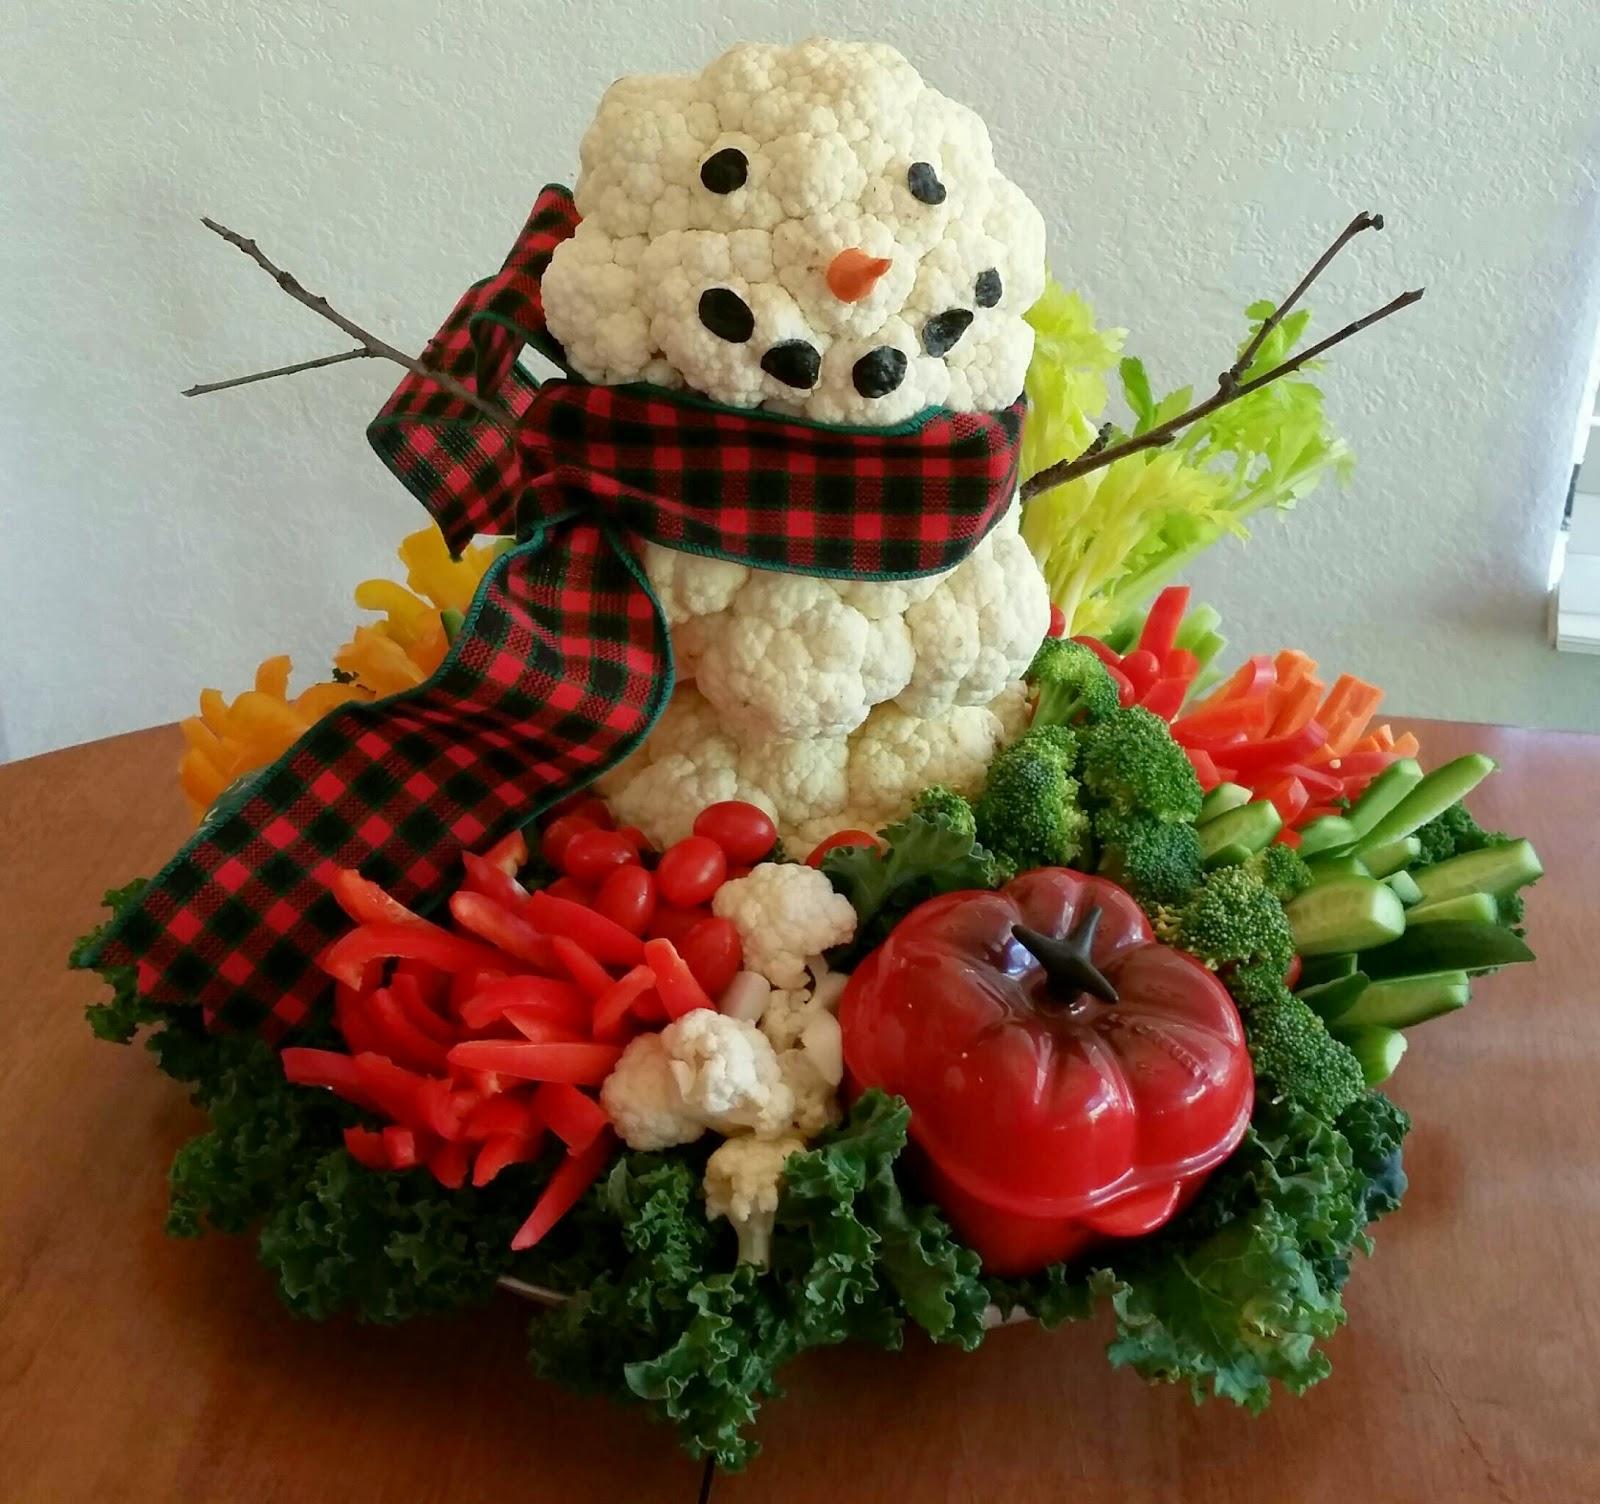 Veggie Snowman Platter